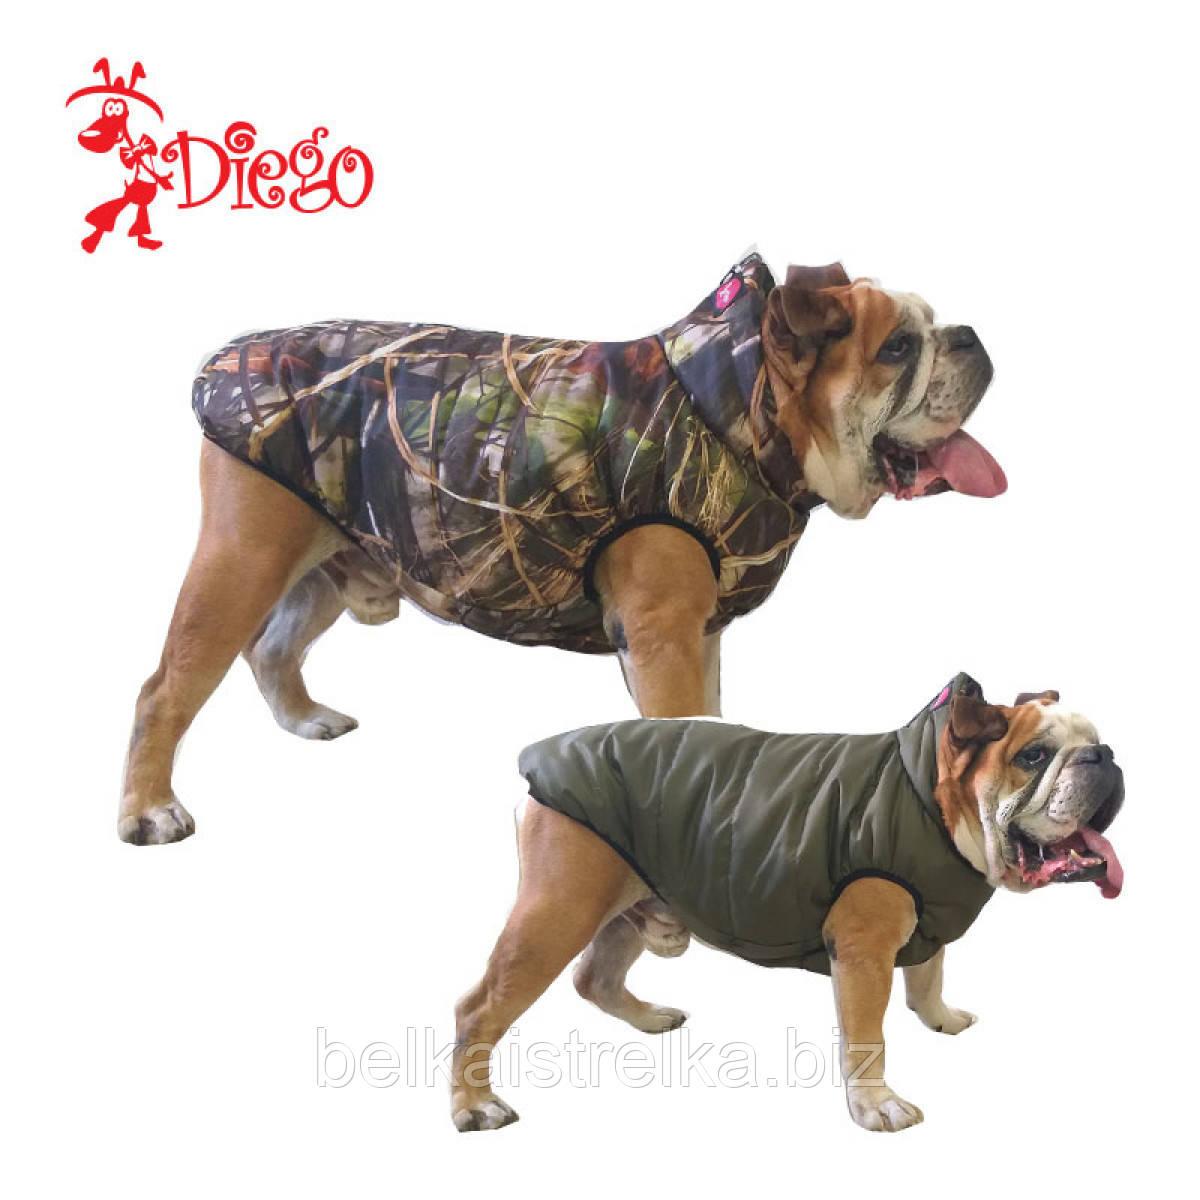 Жилет для собаки двухсторонний DIEGO sport double 4/8 Хантер, размер 4